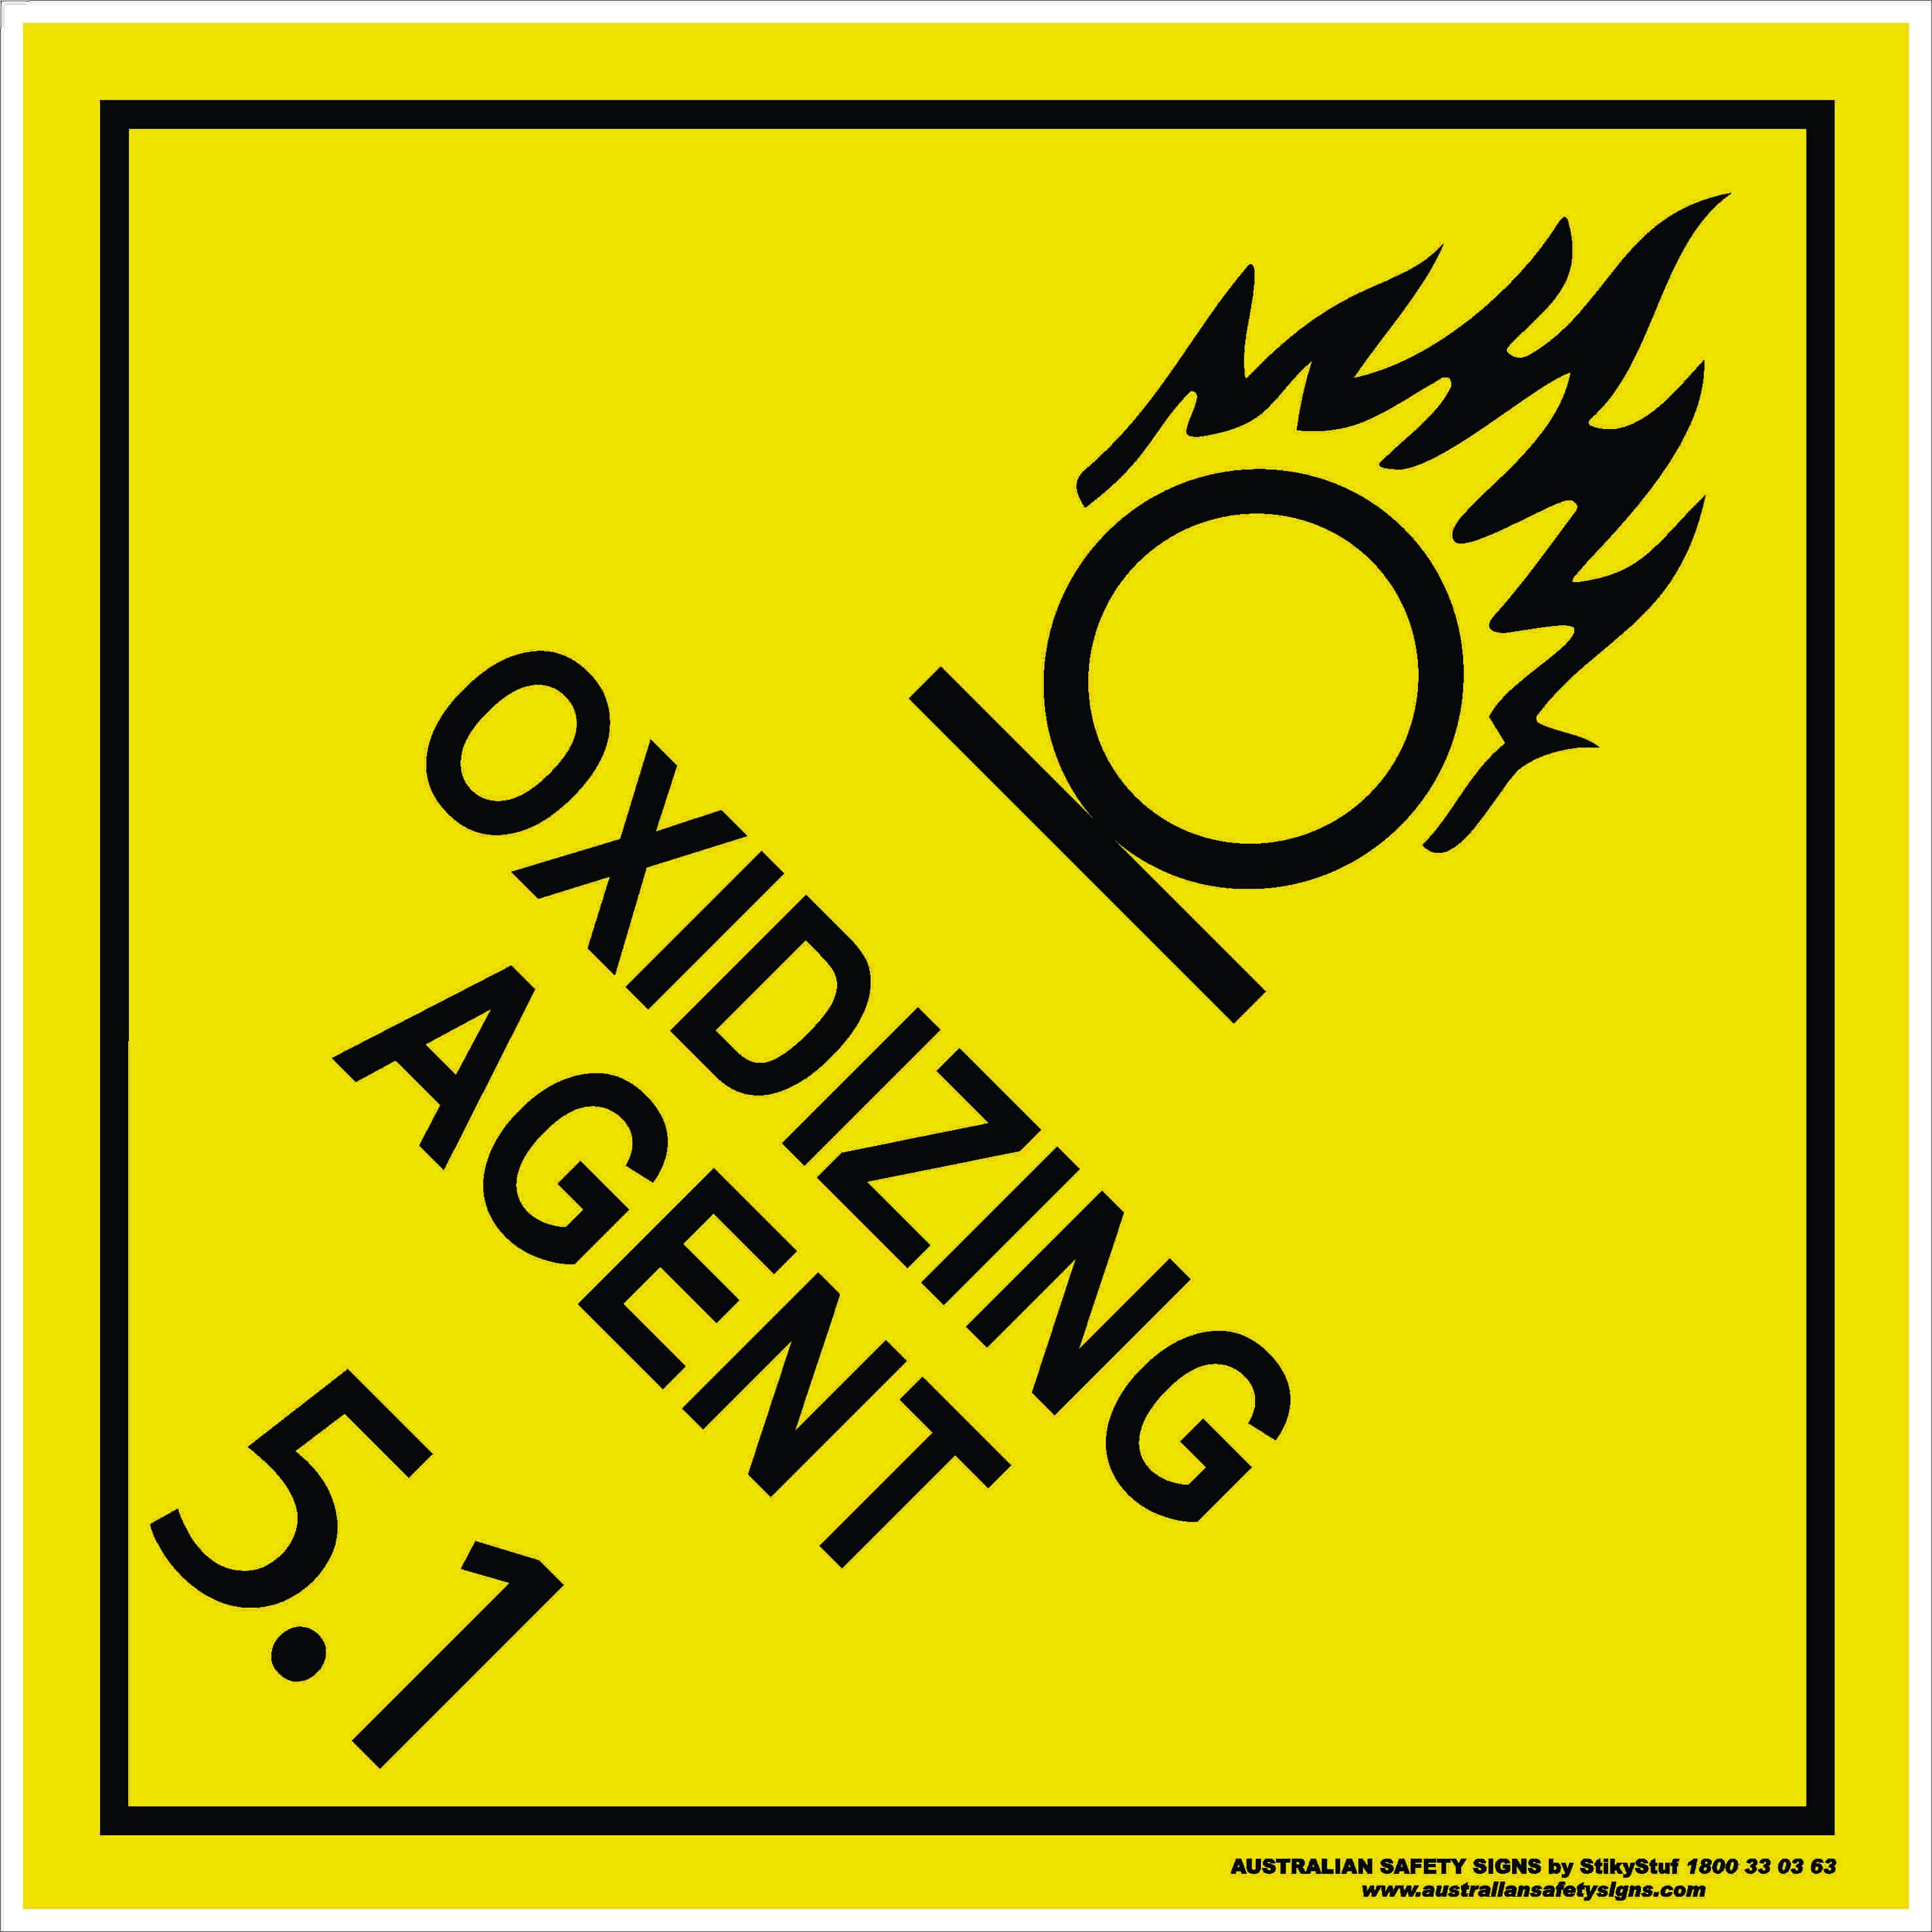 Hazchem Signs CLASS 5 - OXIDIZING AGENT 5.1